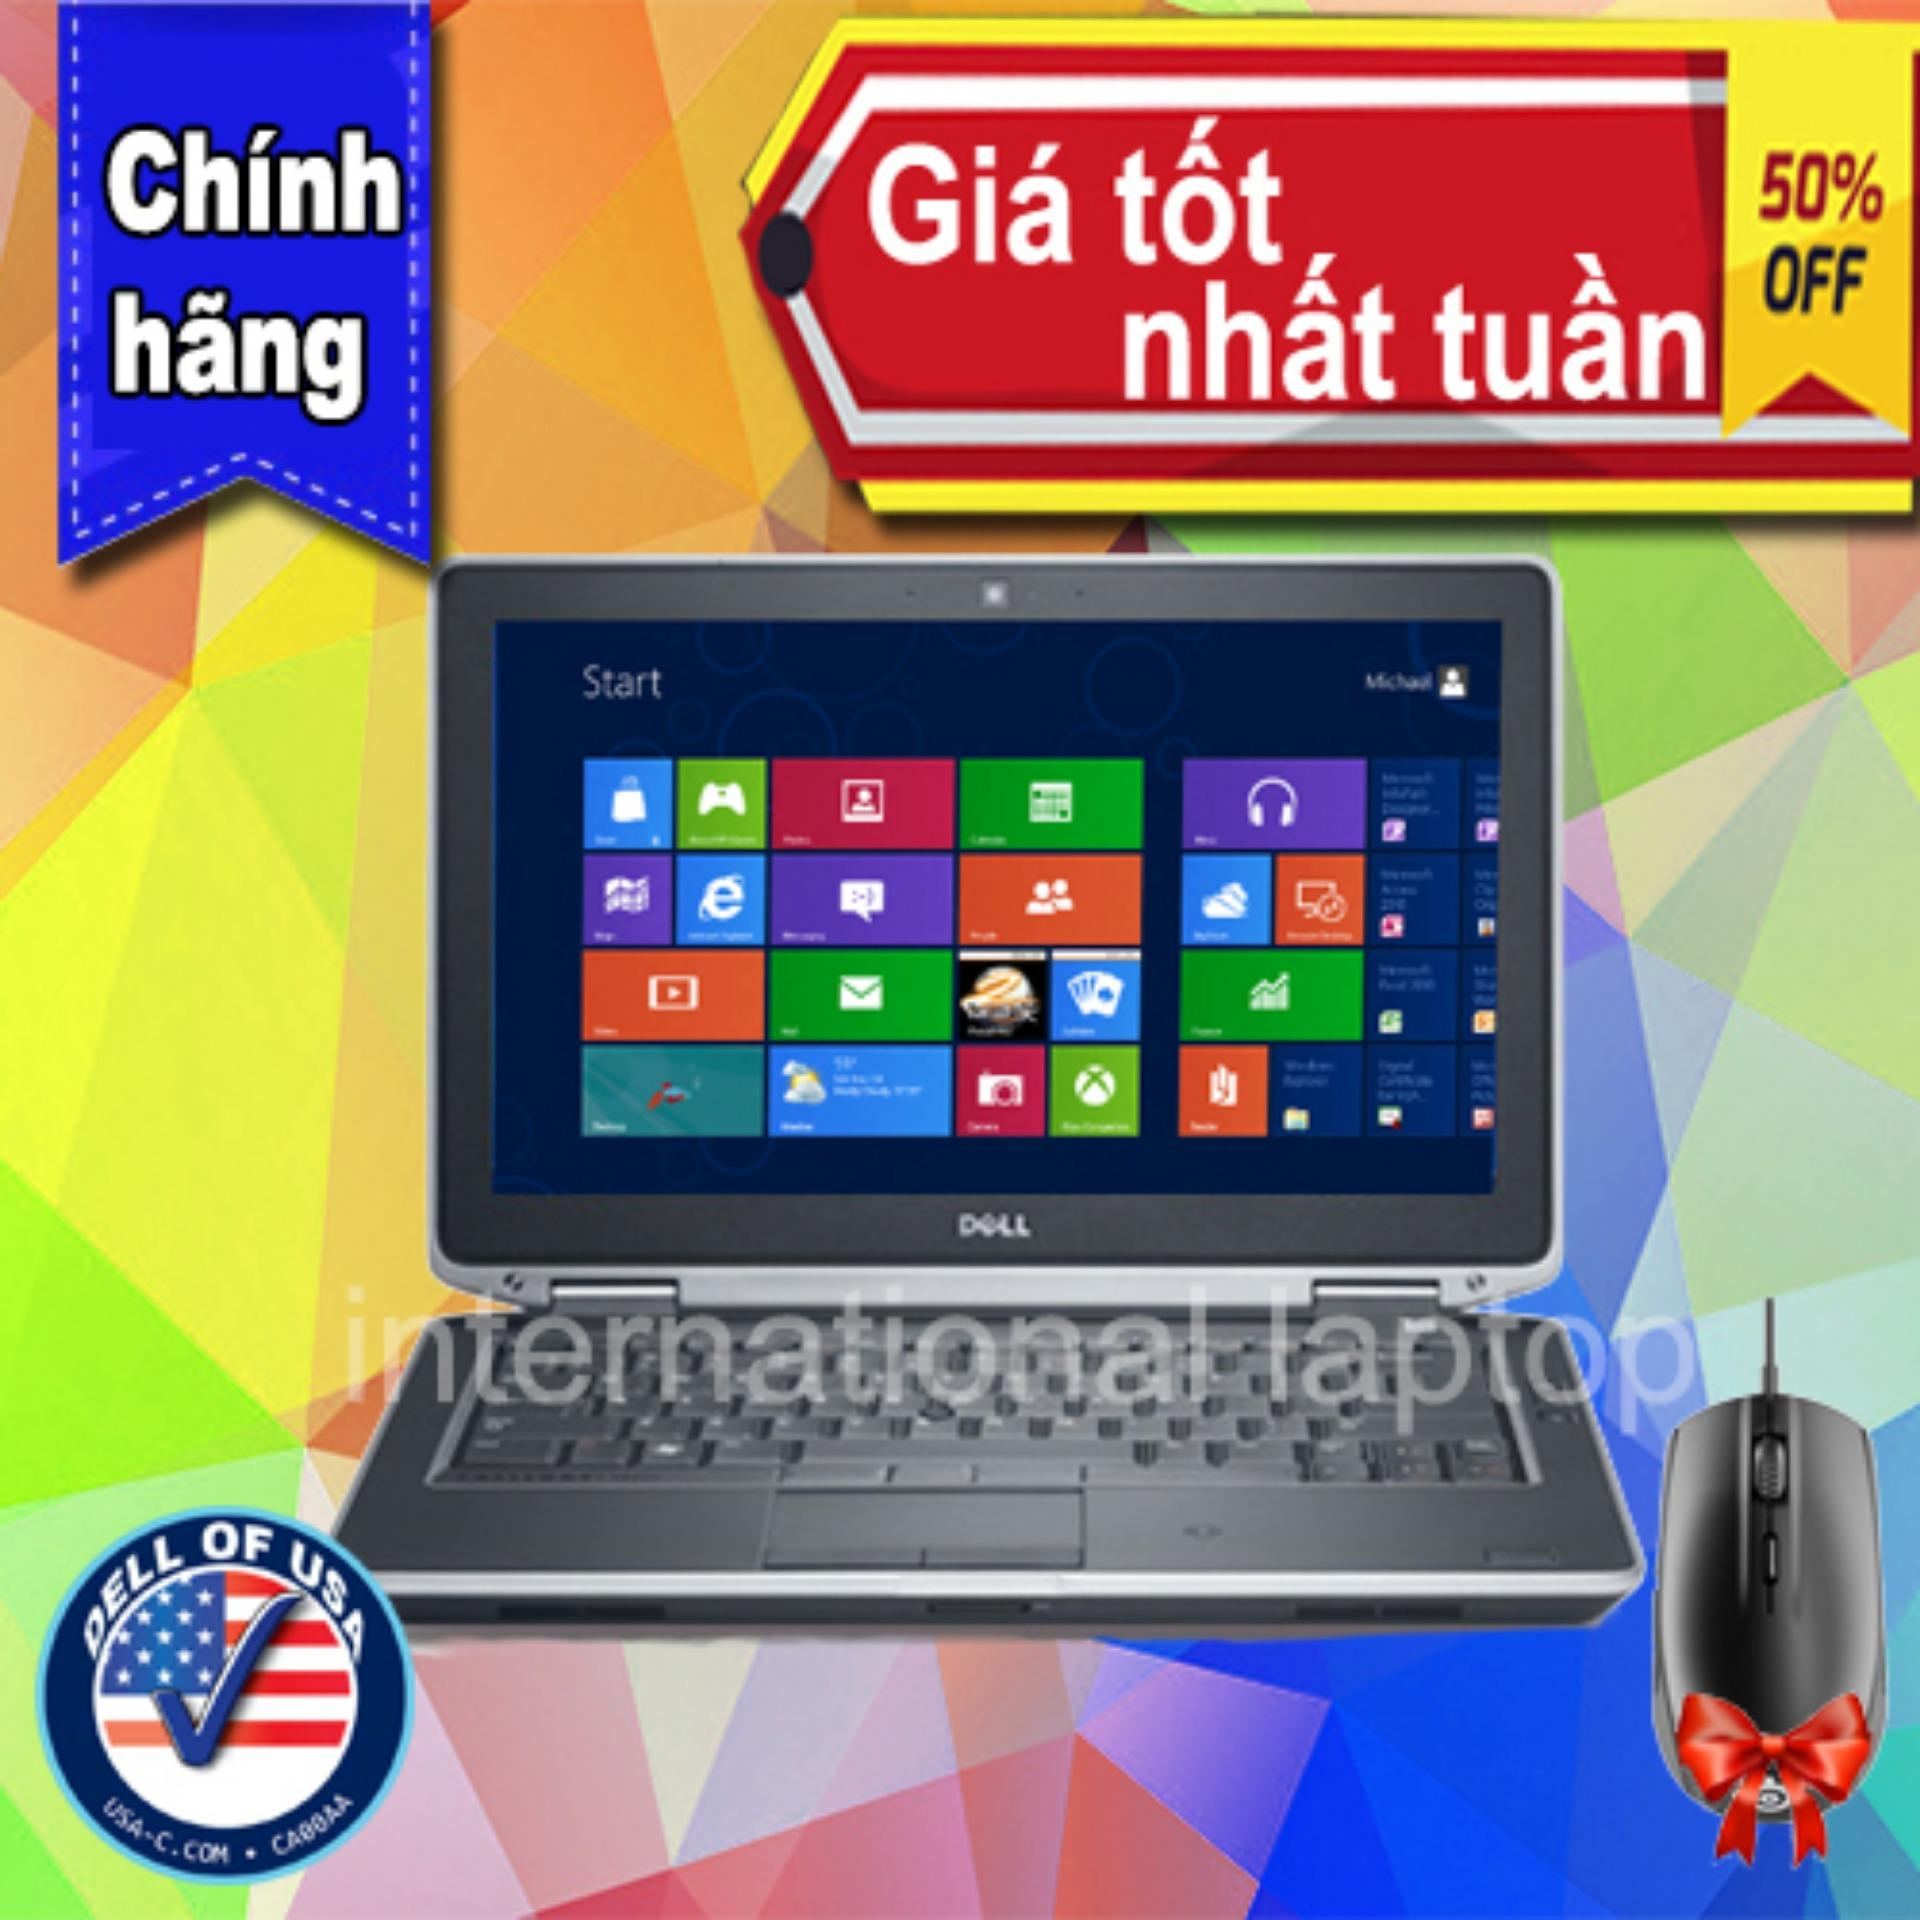 Bán Laptop Dell Latitude E6330 I7 8 1Tb Hang Nhập Khẩu Trực Tuyến